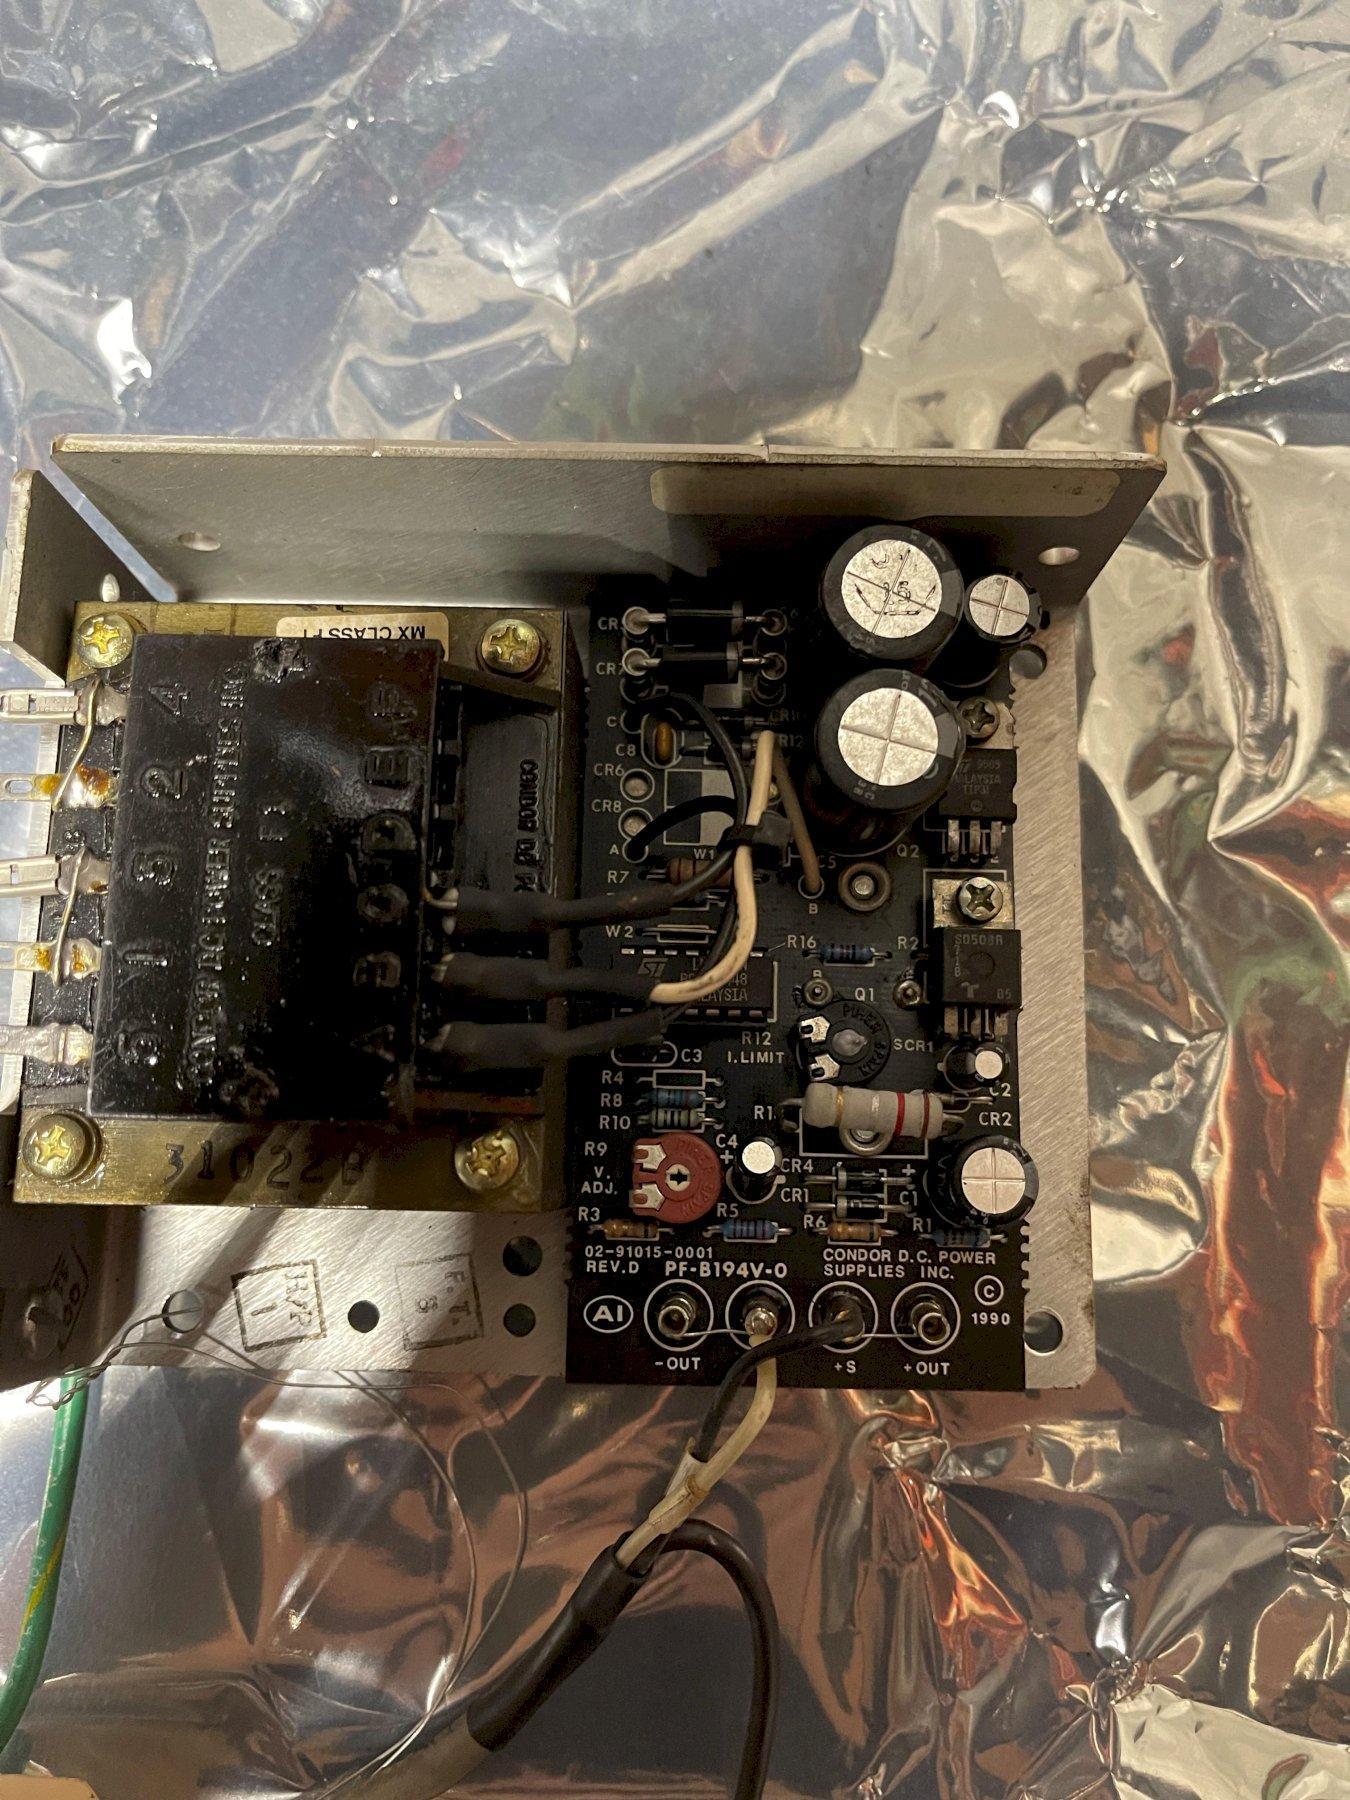 Condor DC Power Supply HB5-3/OVP-A+